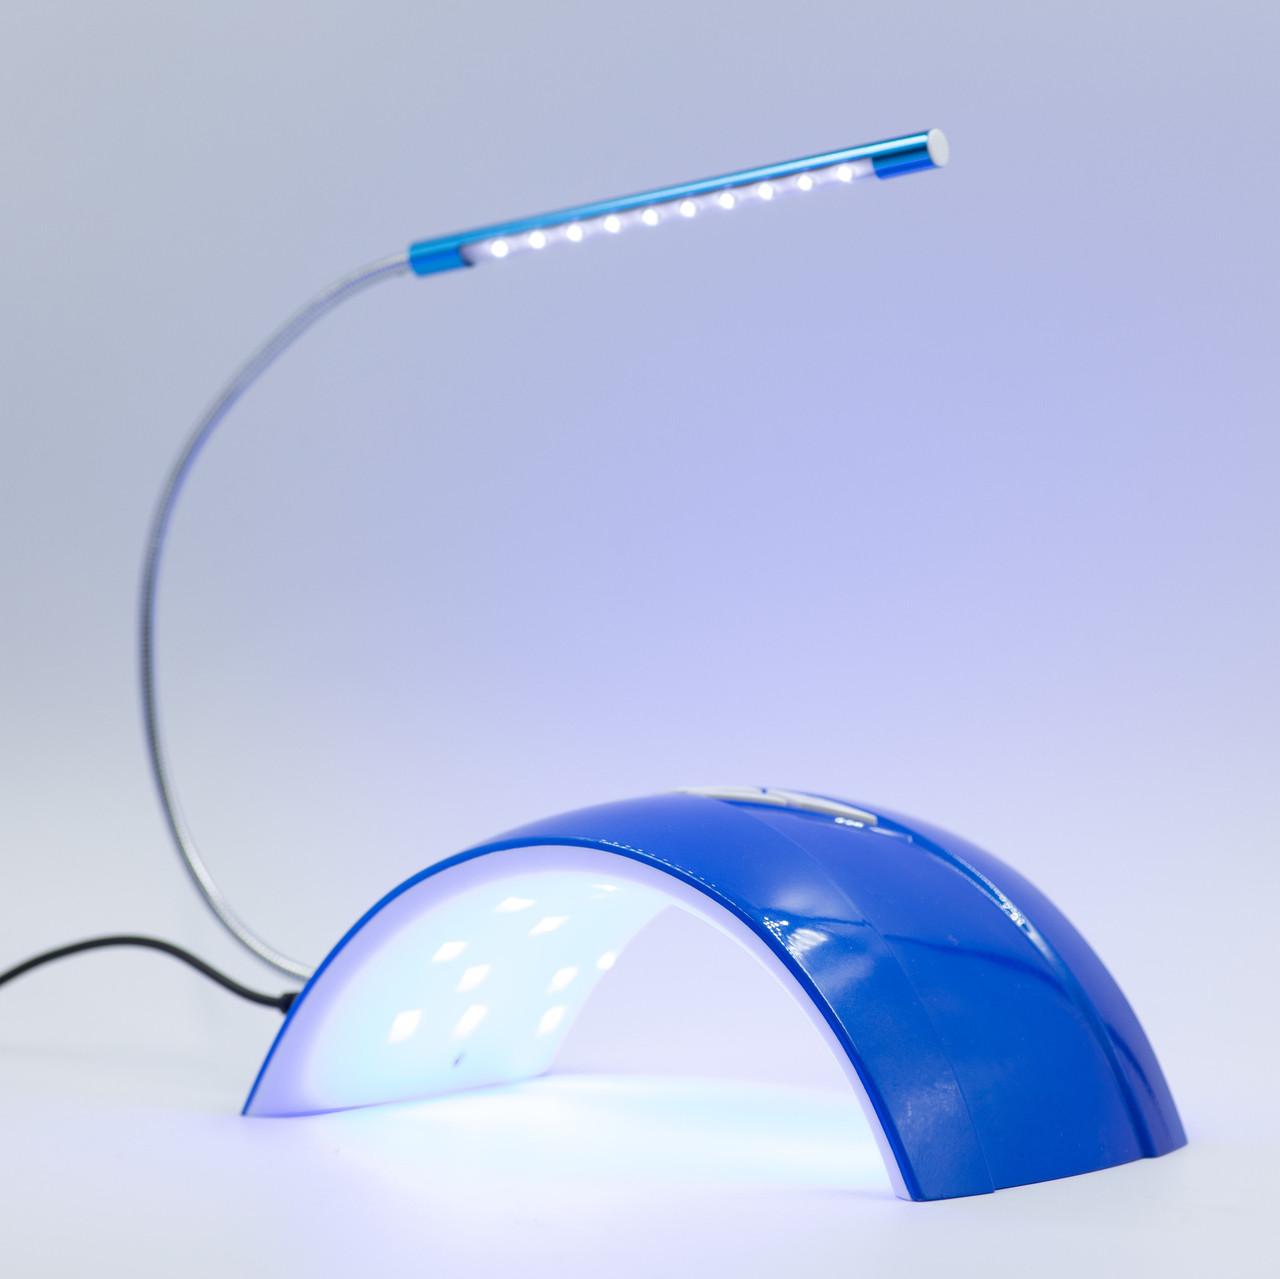 UV Led лампа для наращивания ногтей 48W SUN 668 с led освещением